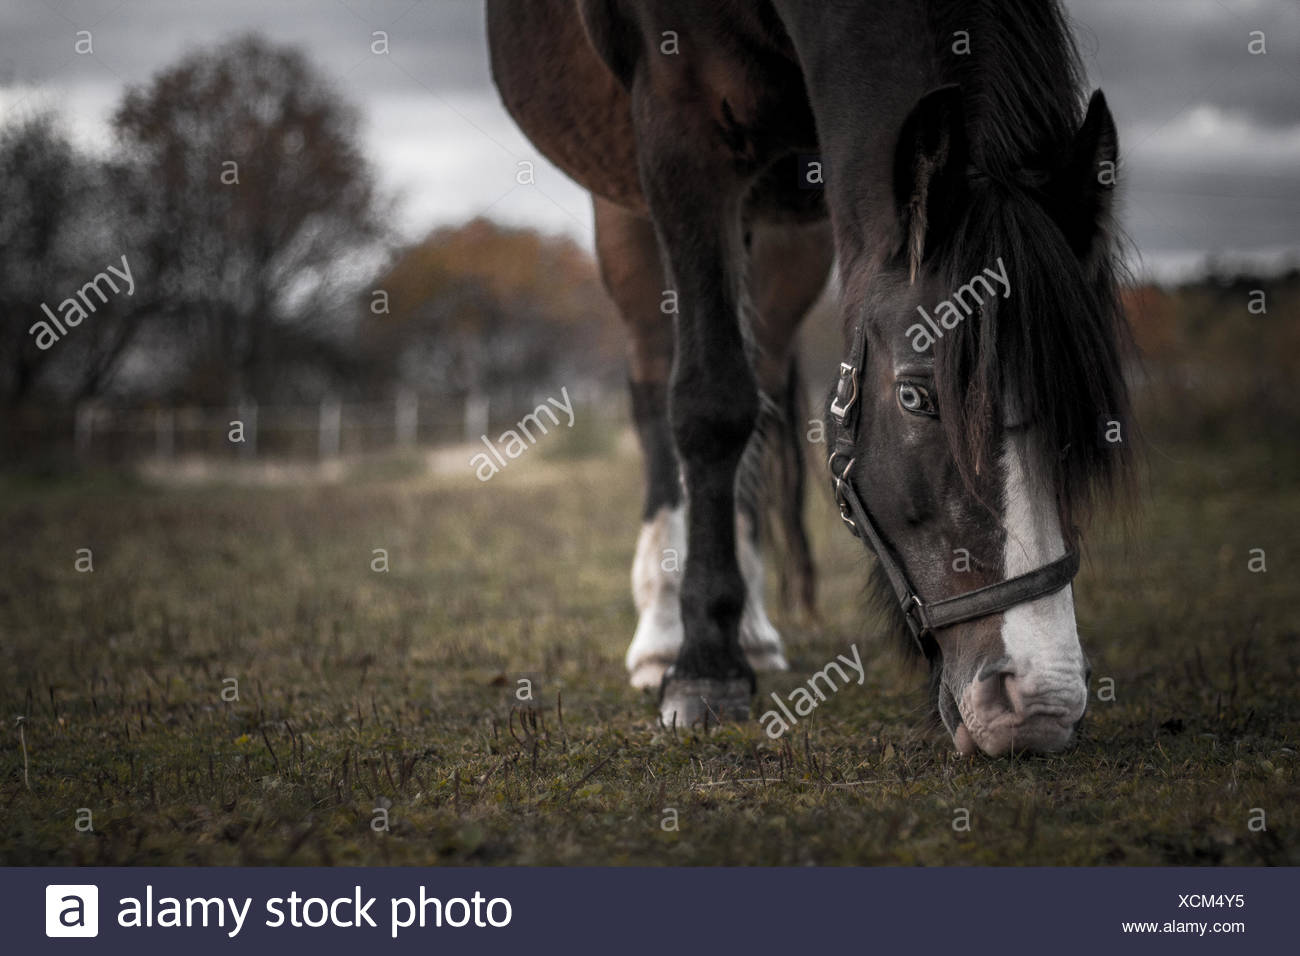 Norway, Horse grazing in pasture - Stock Image